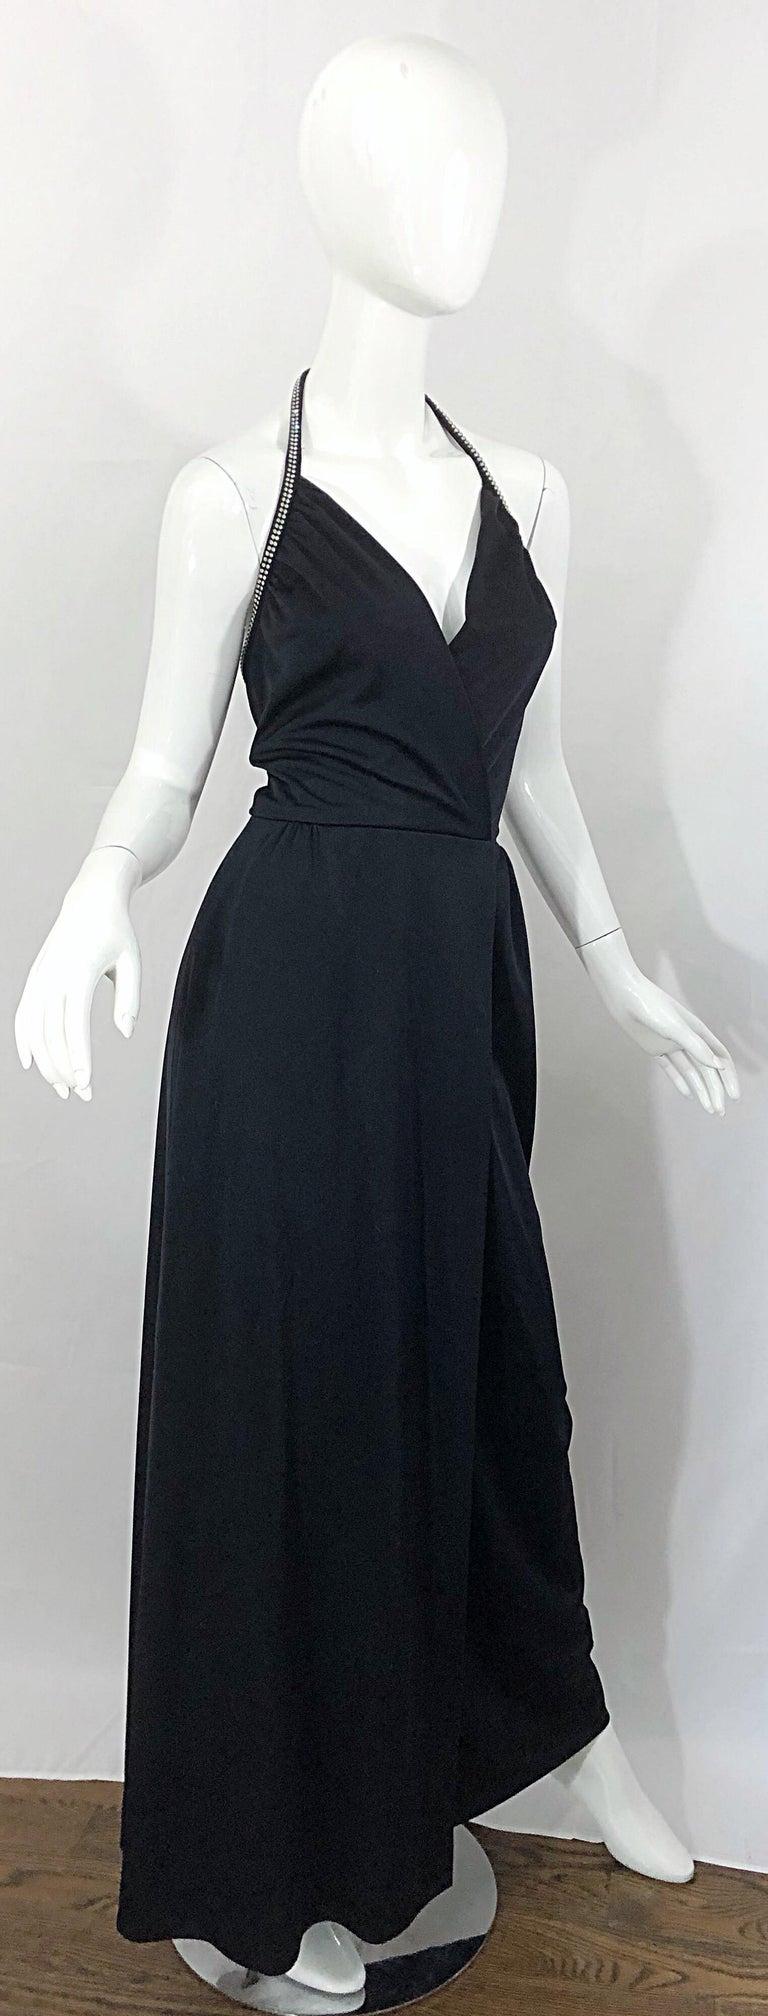 1970s Lilli Diamond Black Jersey Rhinestone Vintage 70s Wrap Maxi Dress Gown For Sale 1